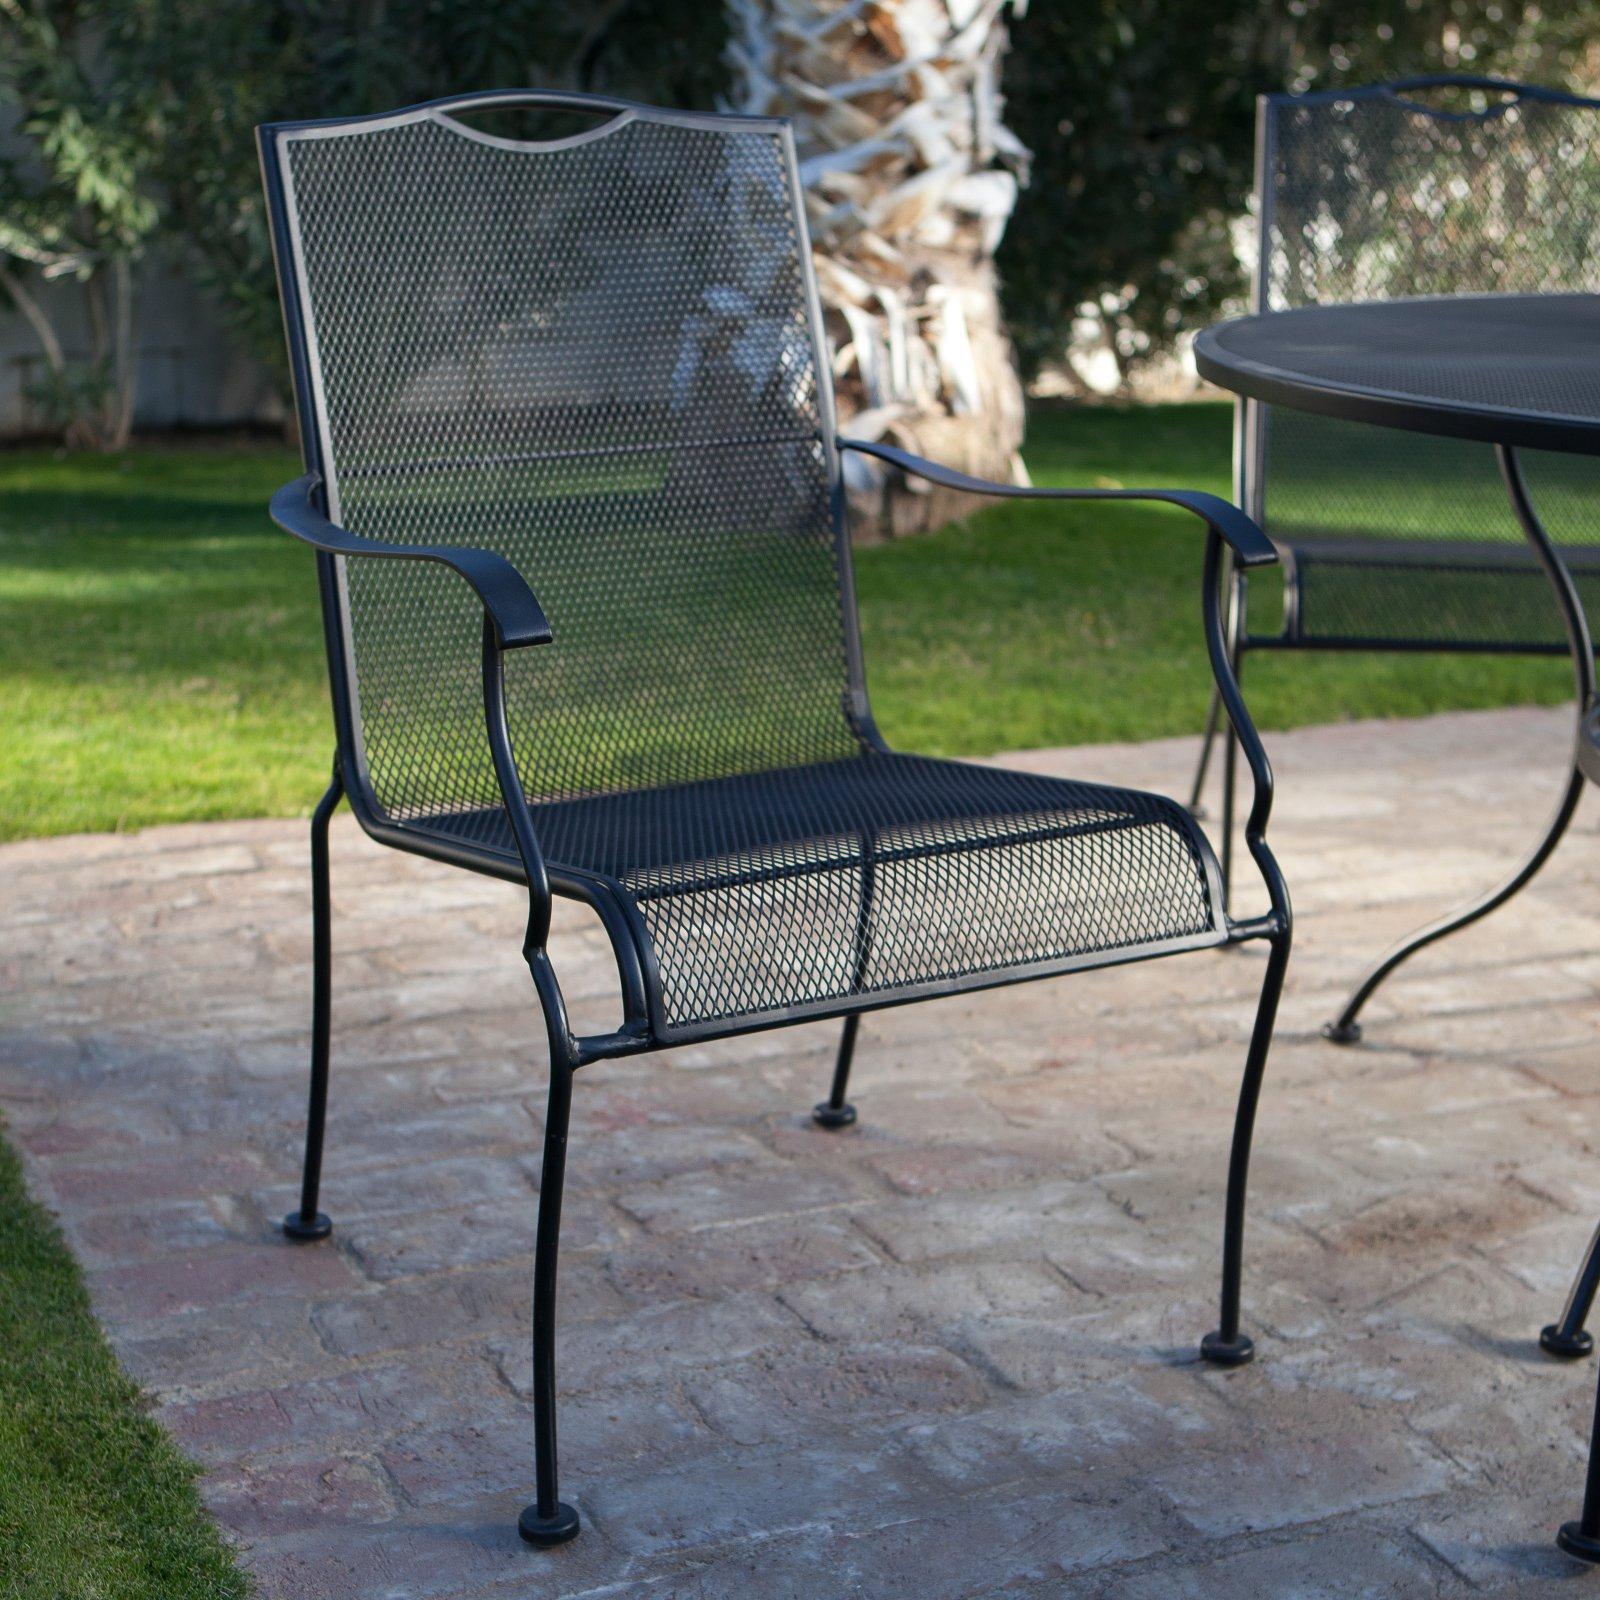 Woodward Belham Living Stanton Wrought Iron Dining Chair ...